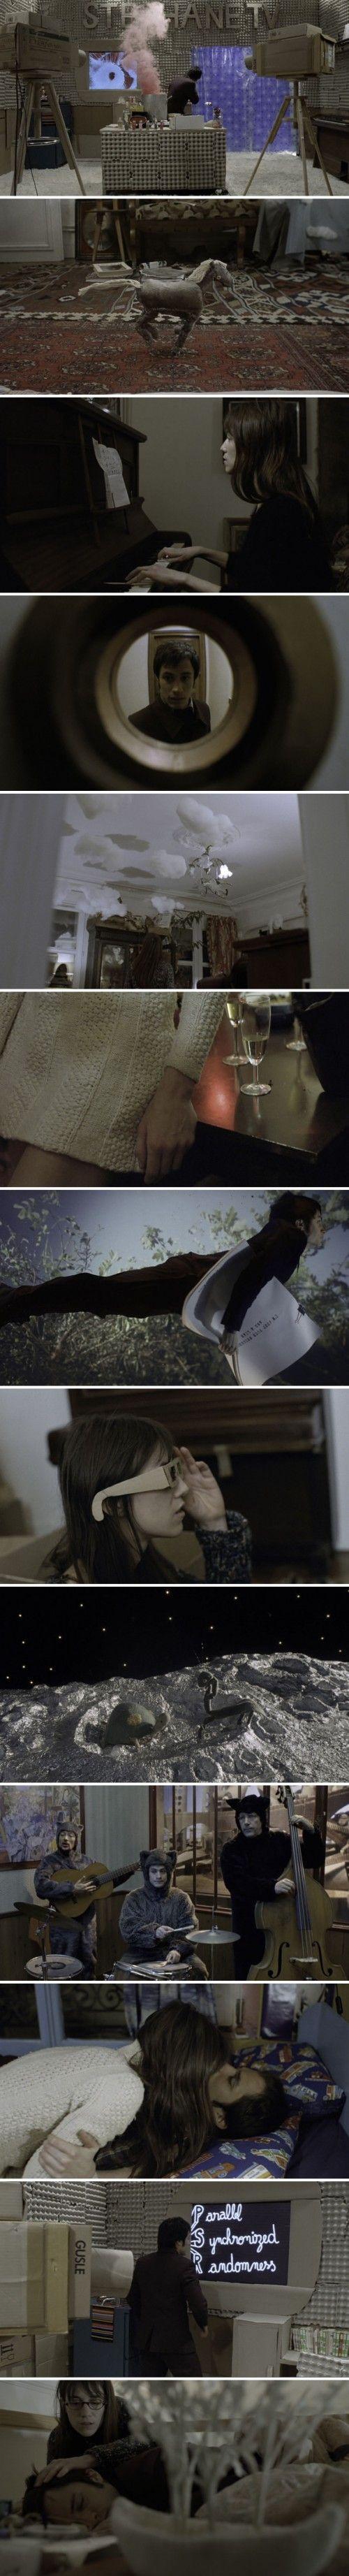 The Science of Sleep.  Michael Gondry.  <3 FILM PREFERITO IN ASSOLUTO